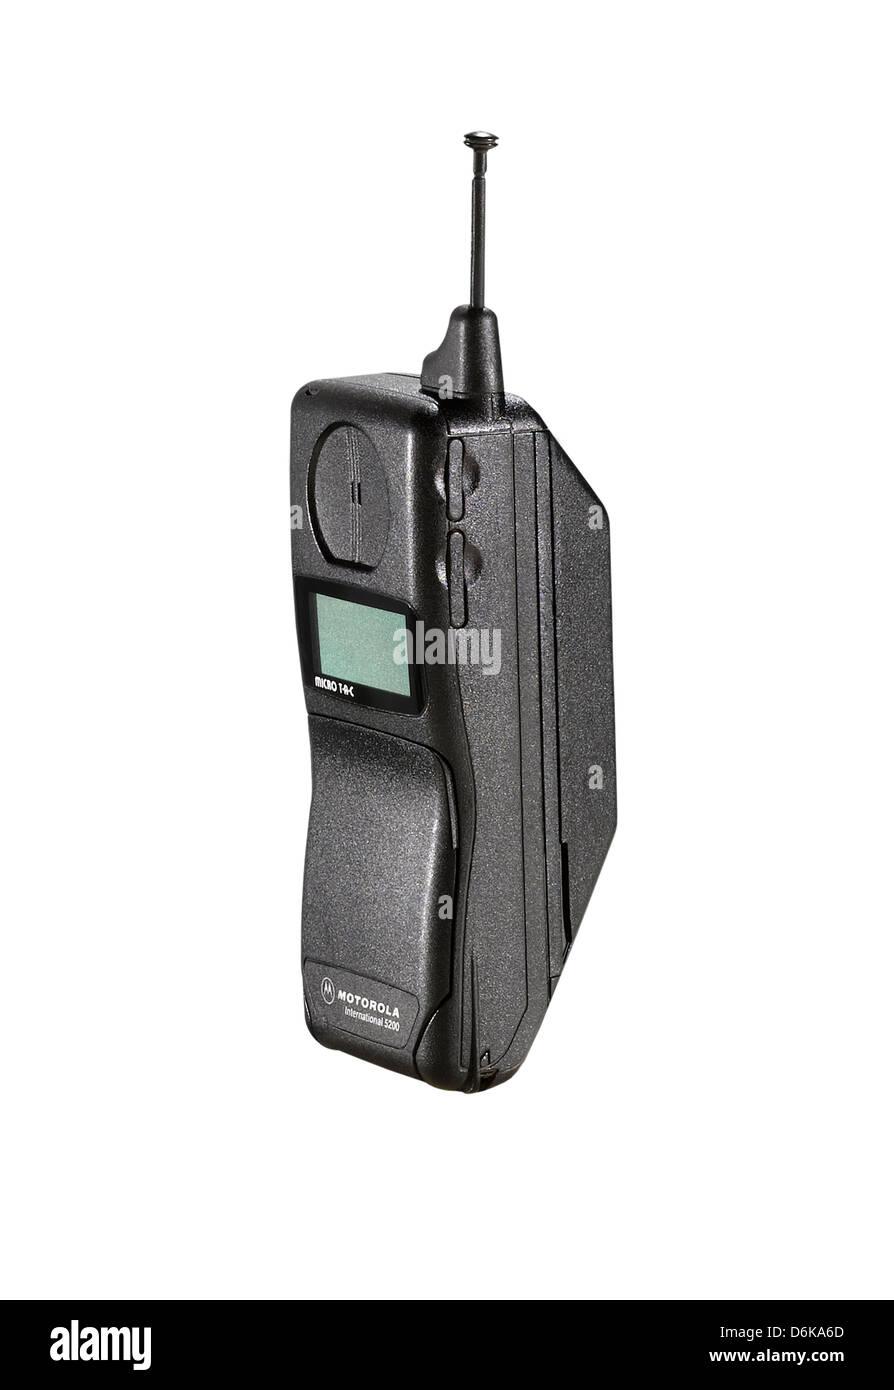 Un vecchio stile flip Motorola mobile phone Immagini Stock